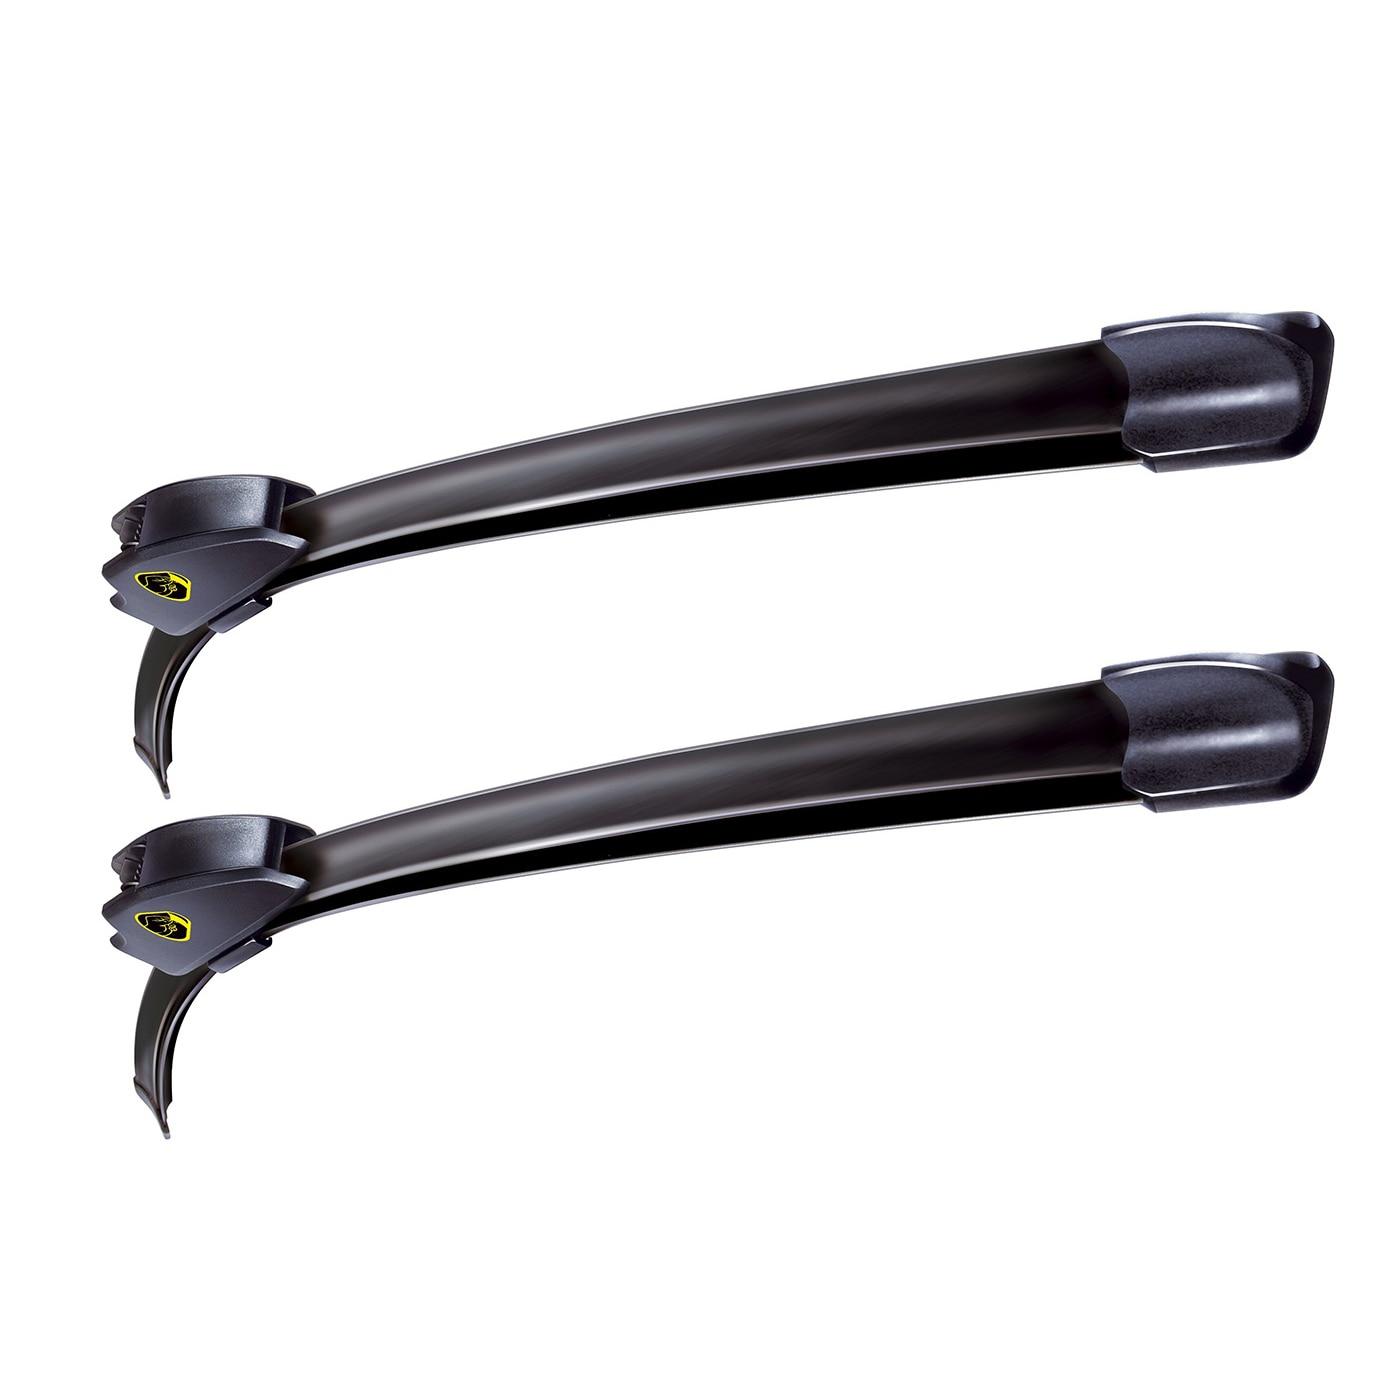 Fotografie Set stergatoare Valeo Silencio X-Trm, 60/47.5 cm pentru VW Golf V, VW Golf VI, VW Passat, VW Jeta III, Skoda Yeti